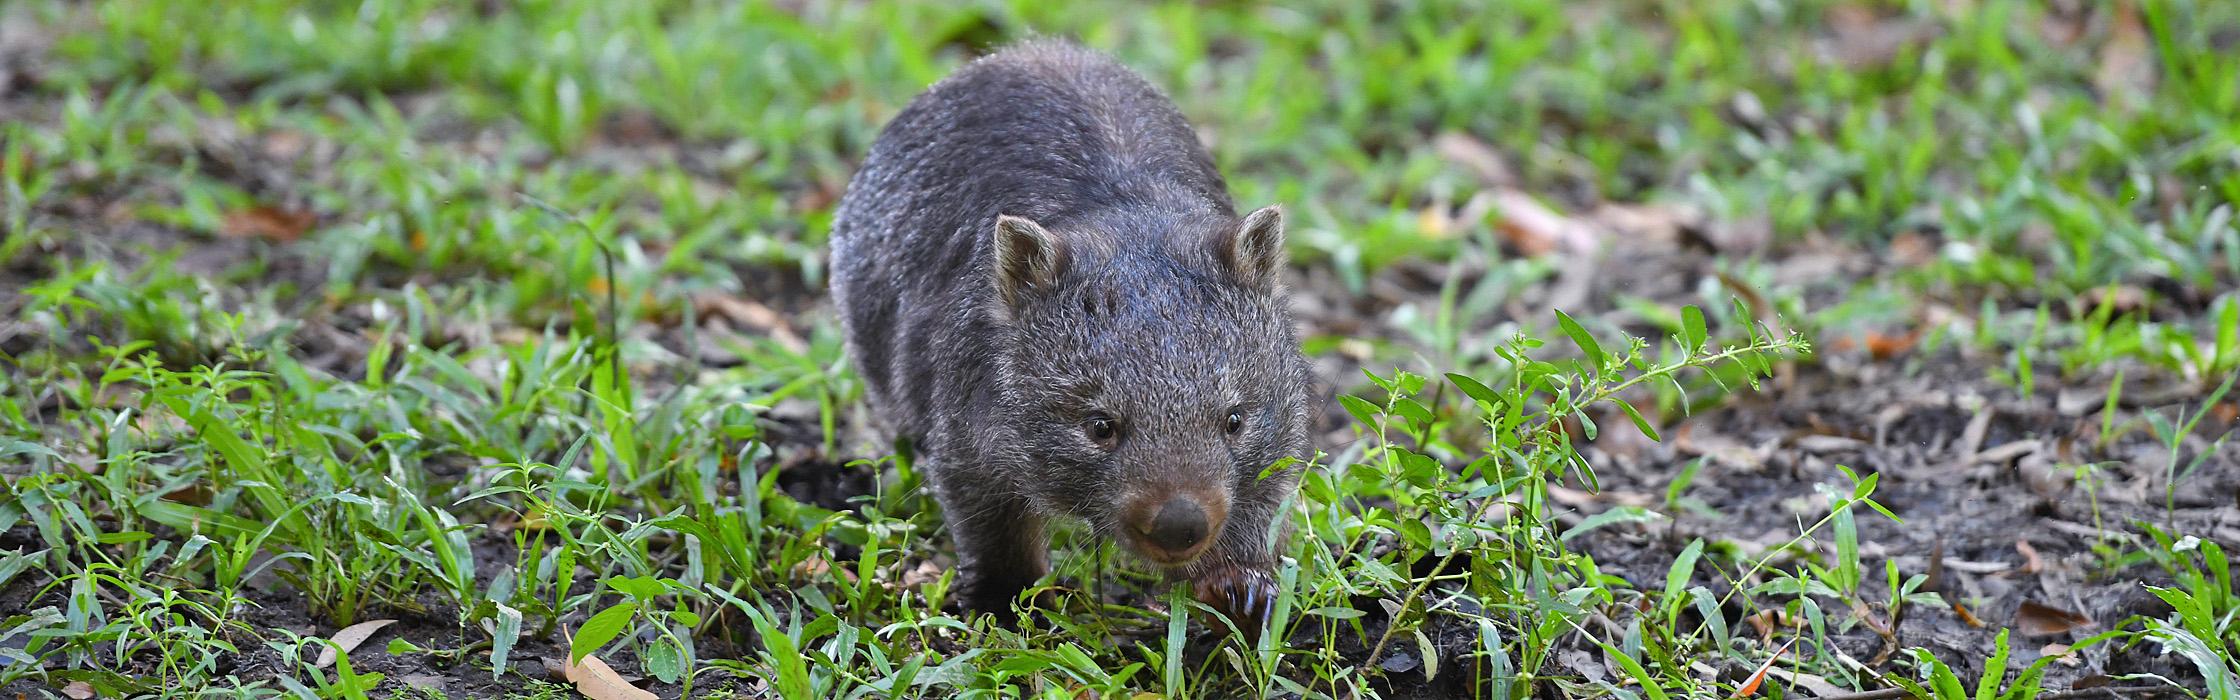 9143B_Wombat(Elle)_AustraliaZoo_AAA-banner